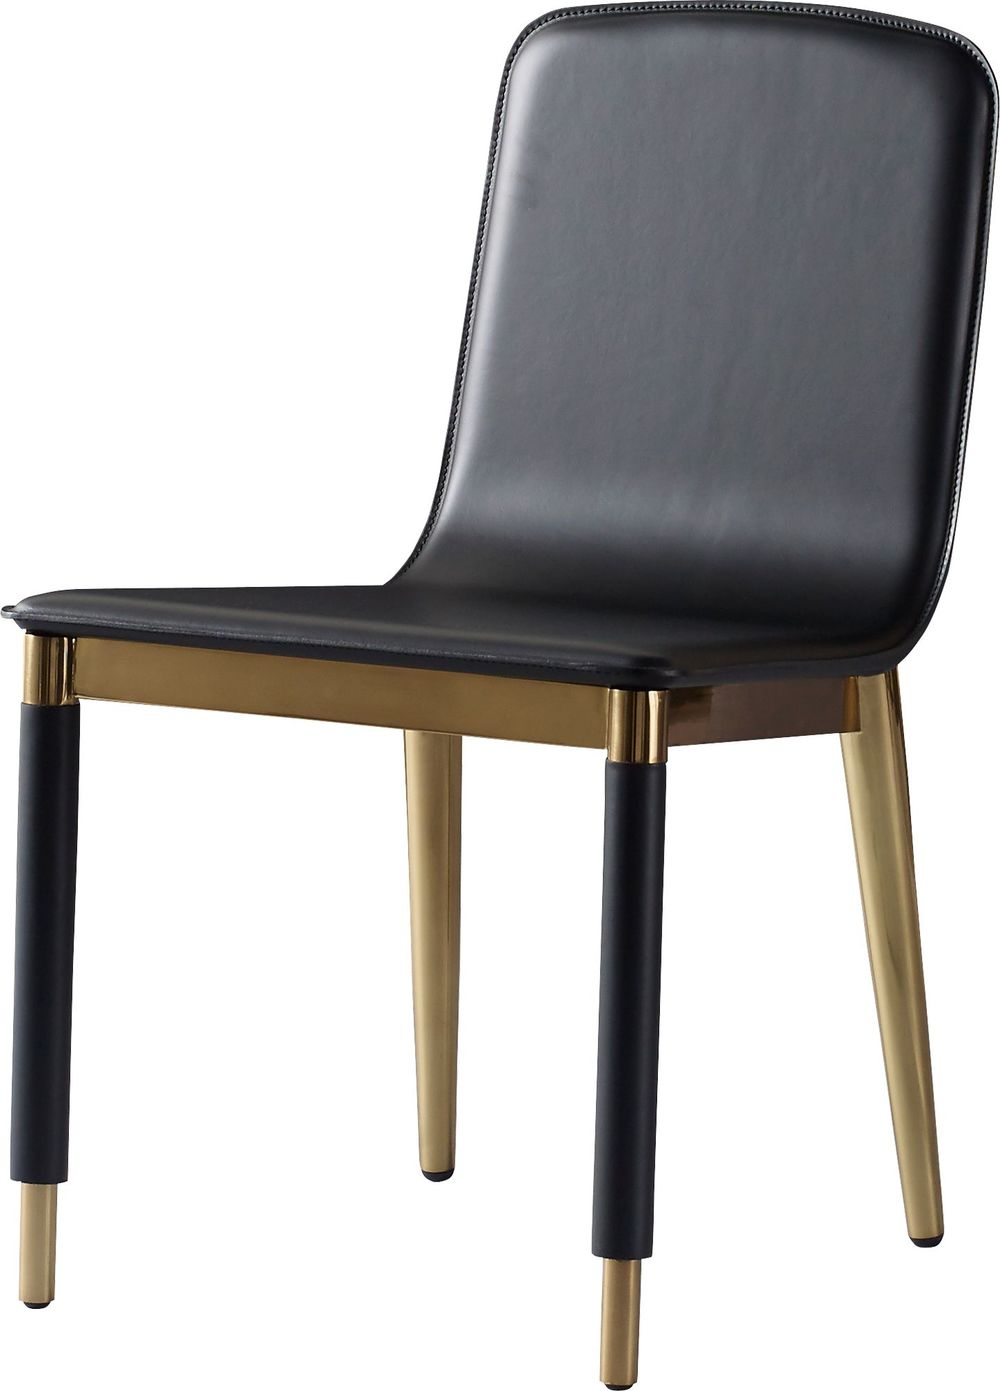 Baker Furniture - Folio Side Chair